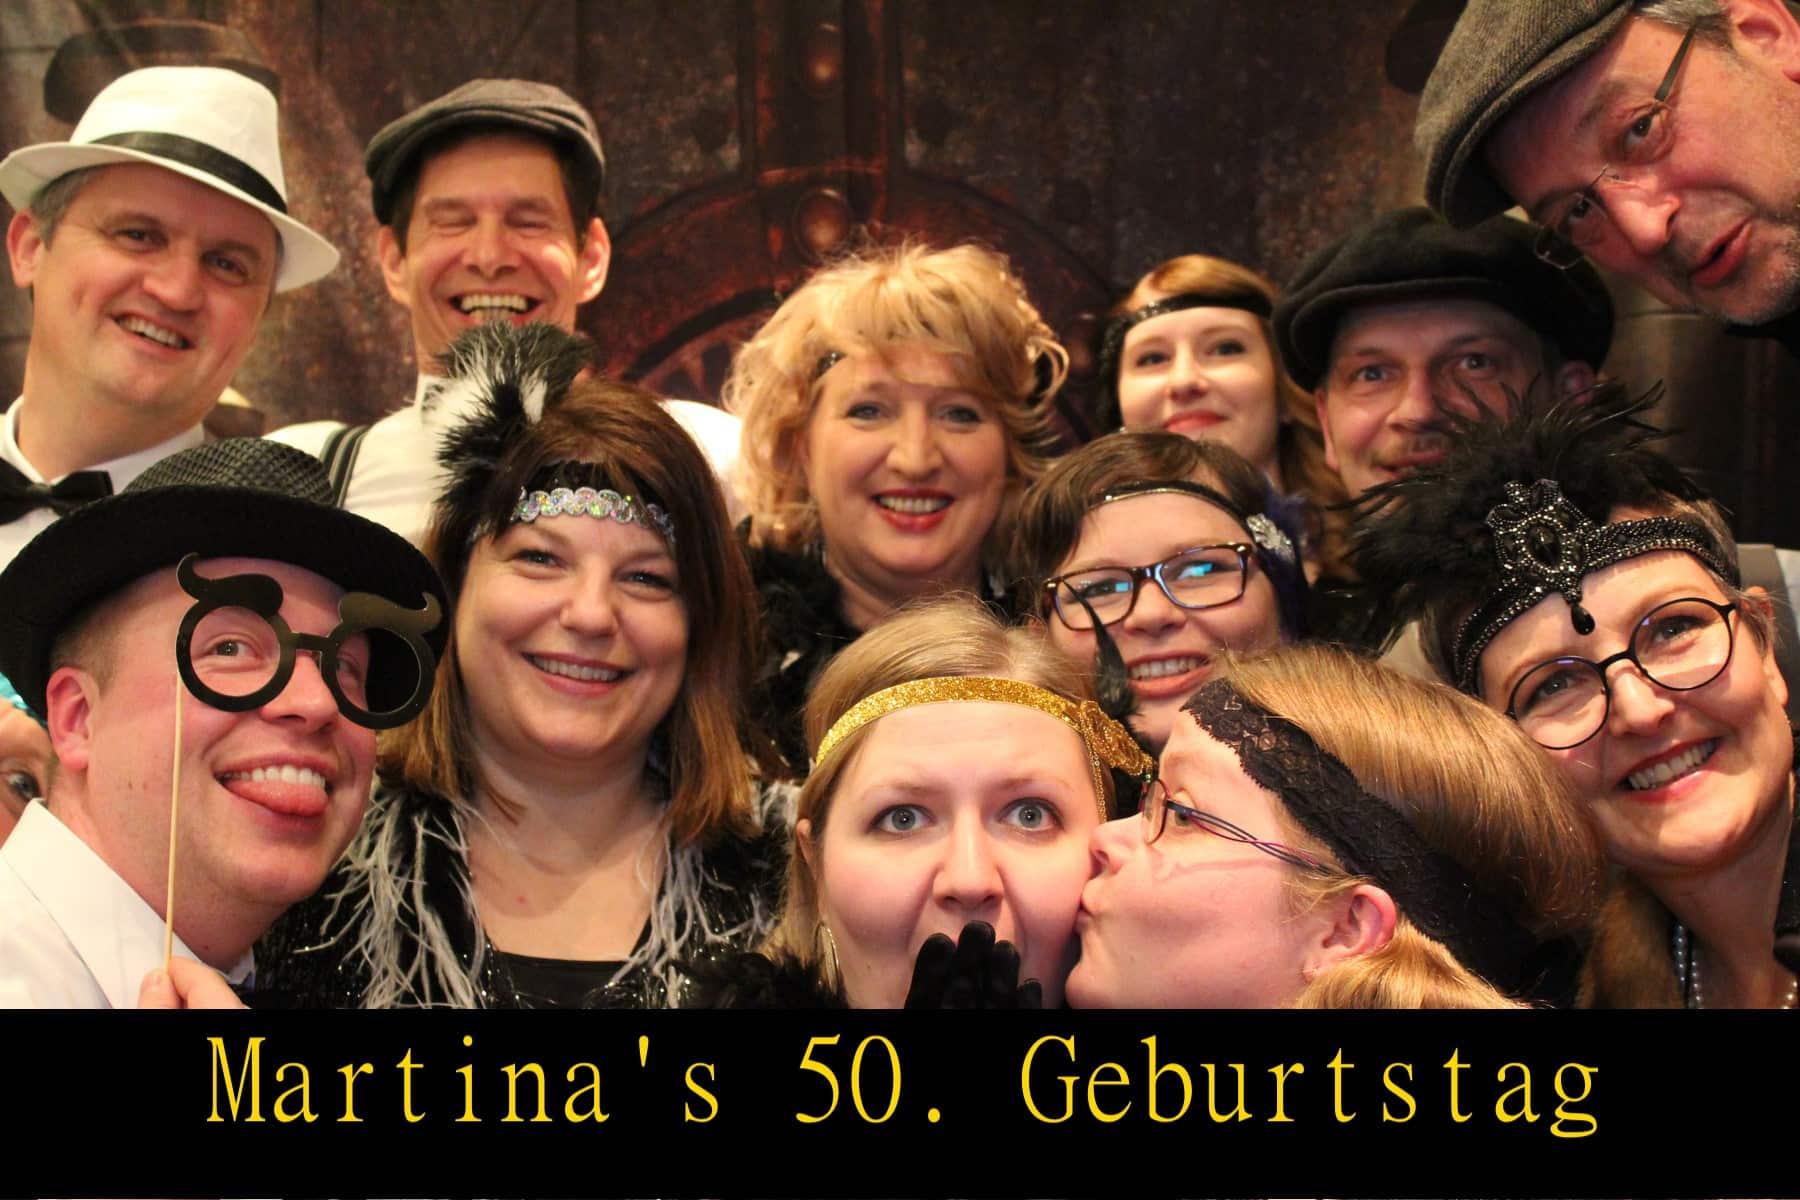 Martinas 50. Geburtstag